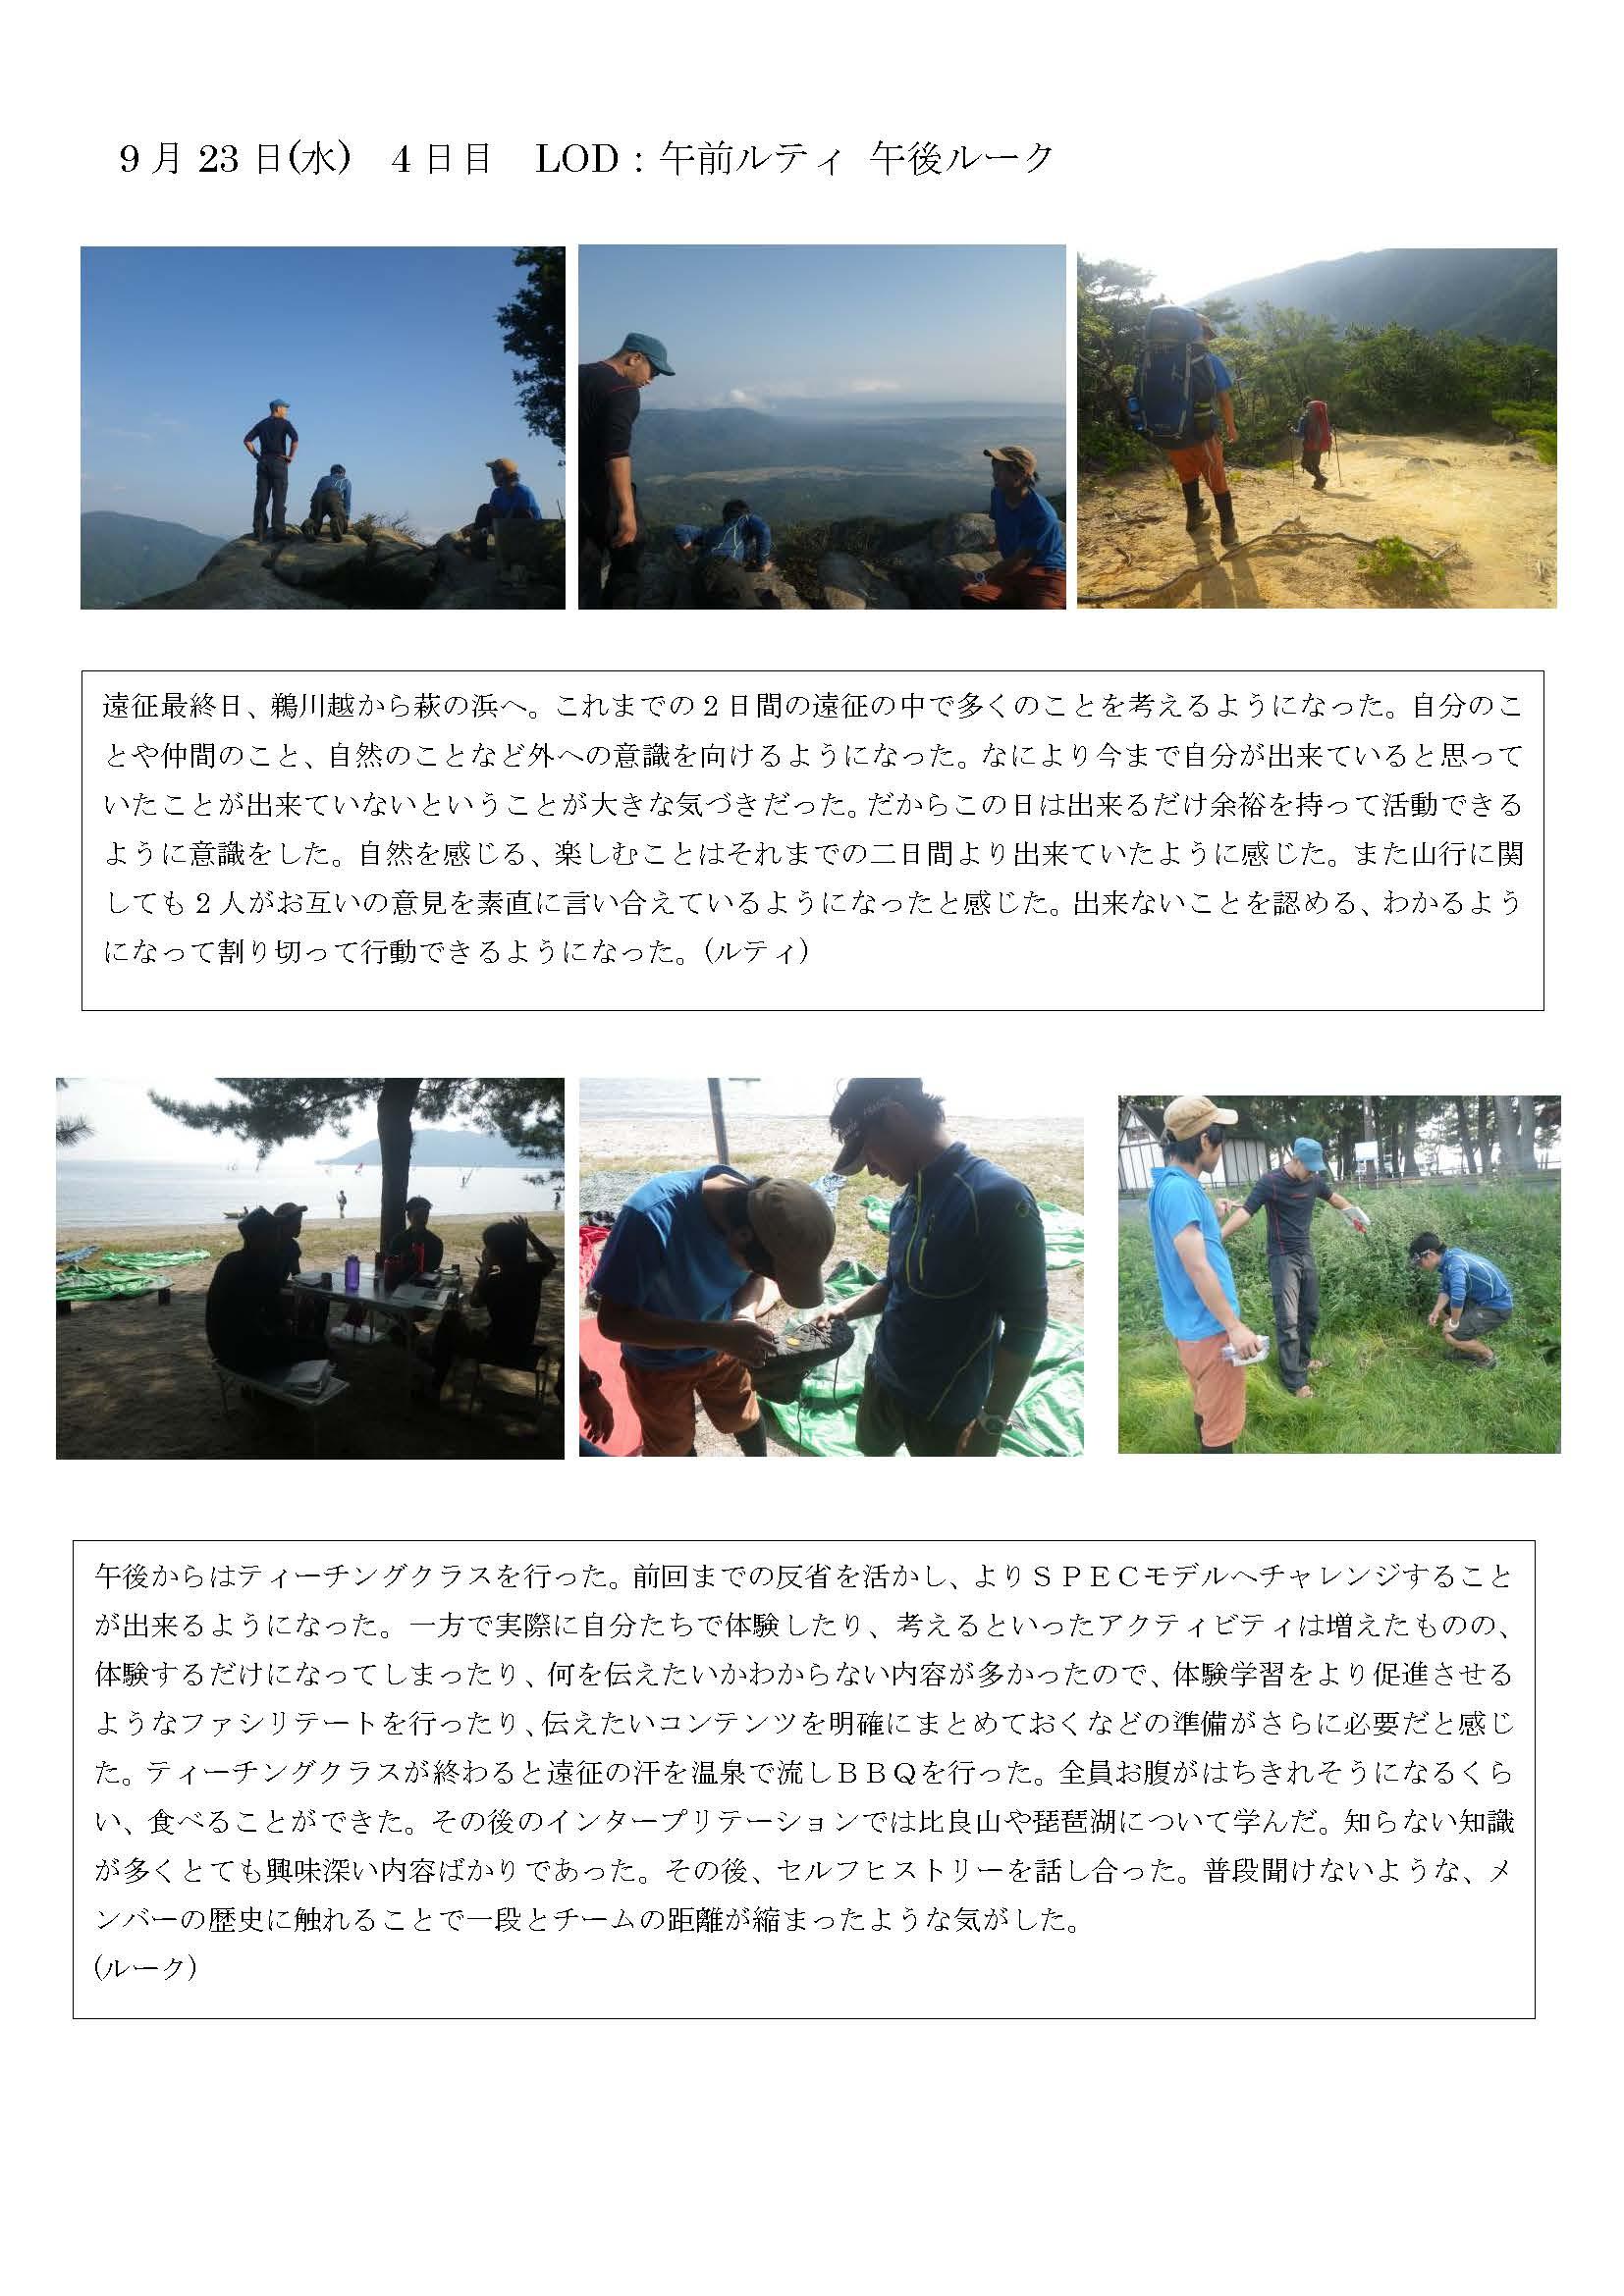 psc_report2015.9_ページ_06